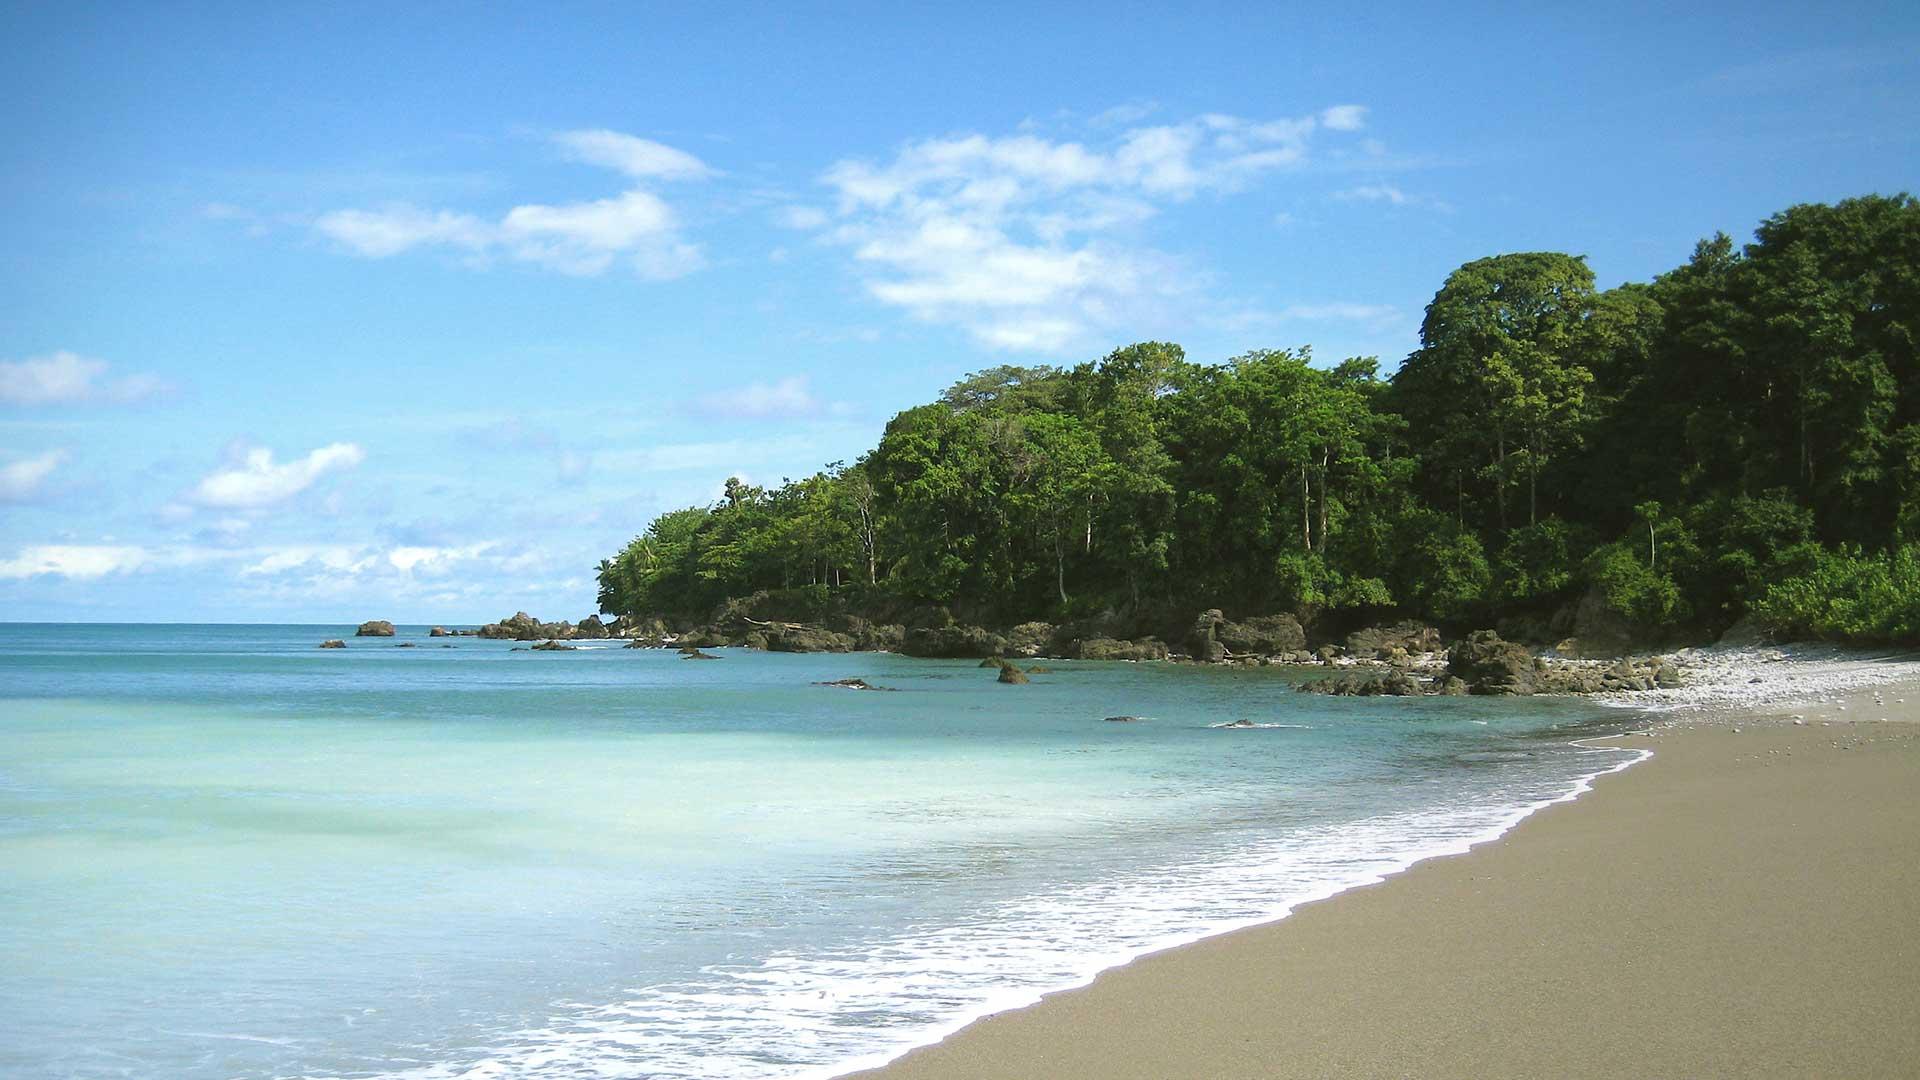 Costa Rica Landscapes Wallpaper HD Free Download